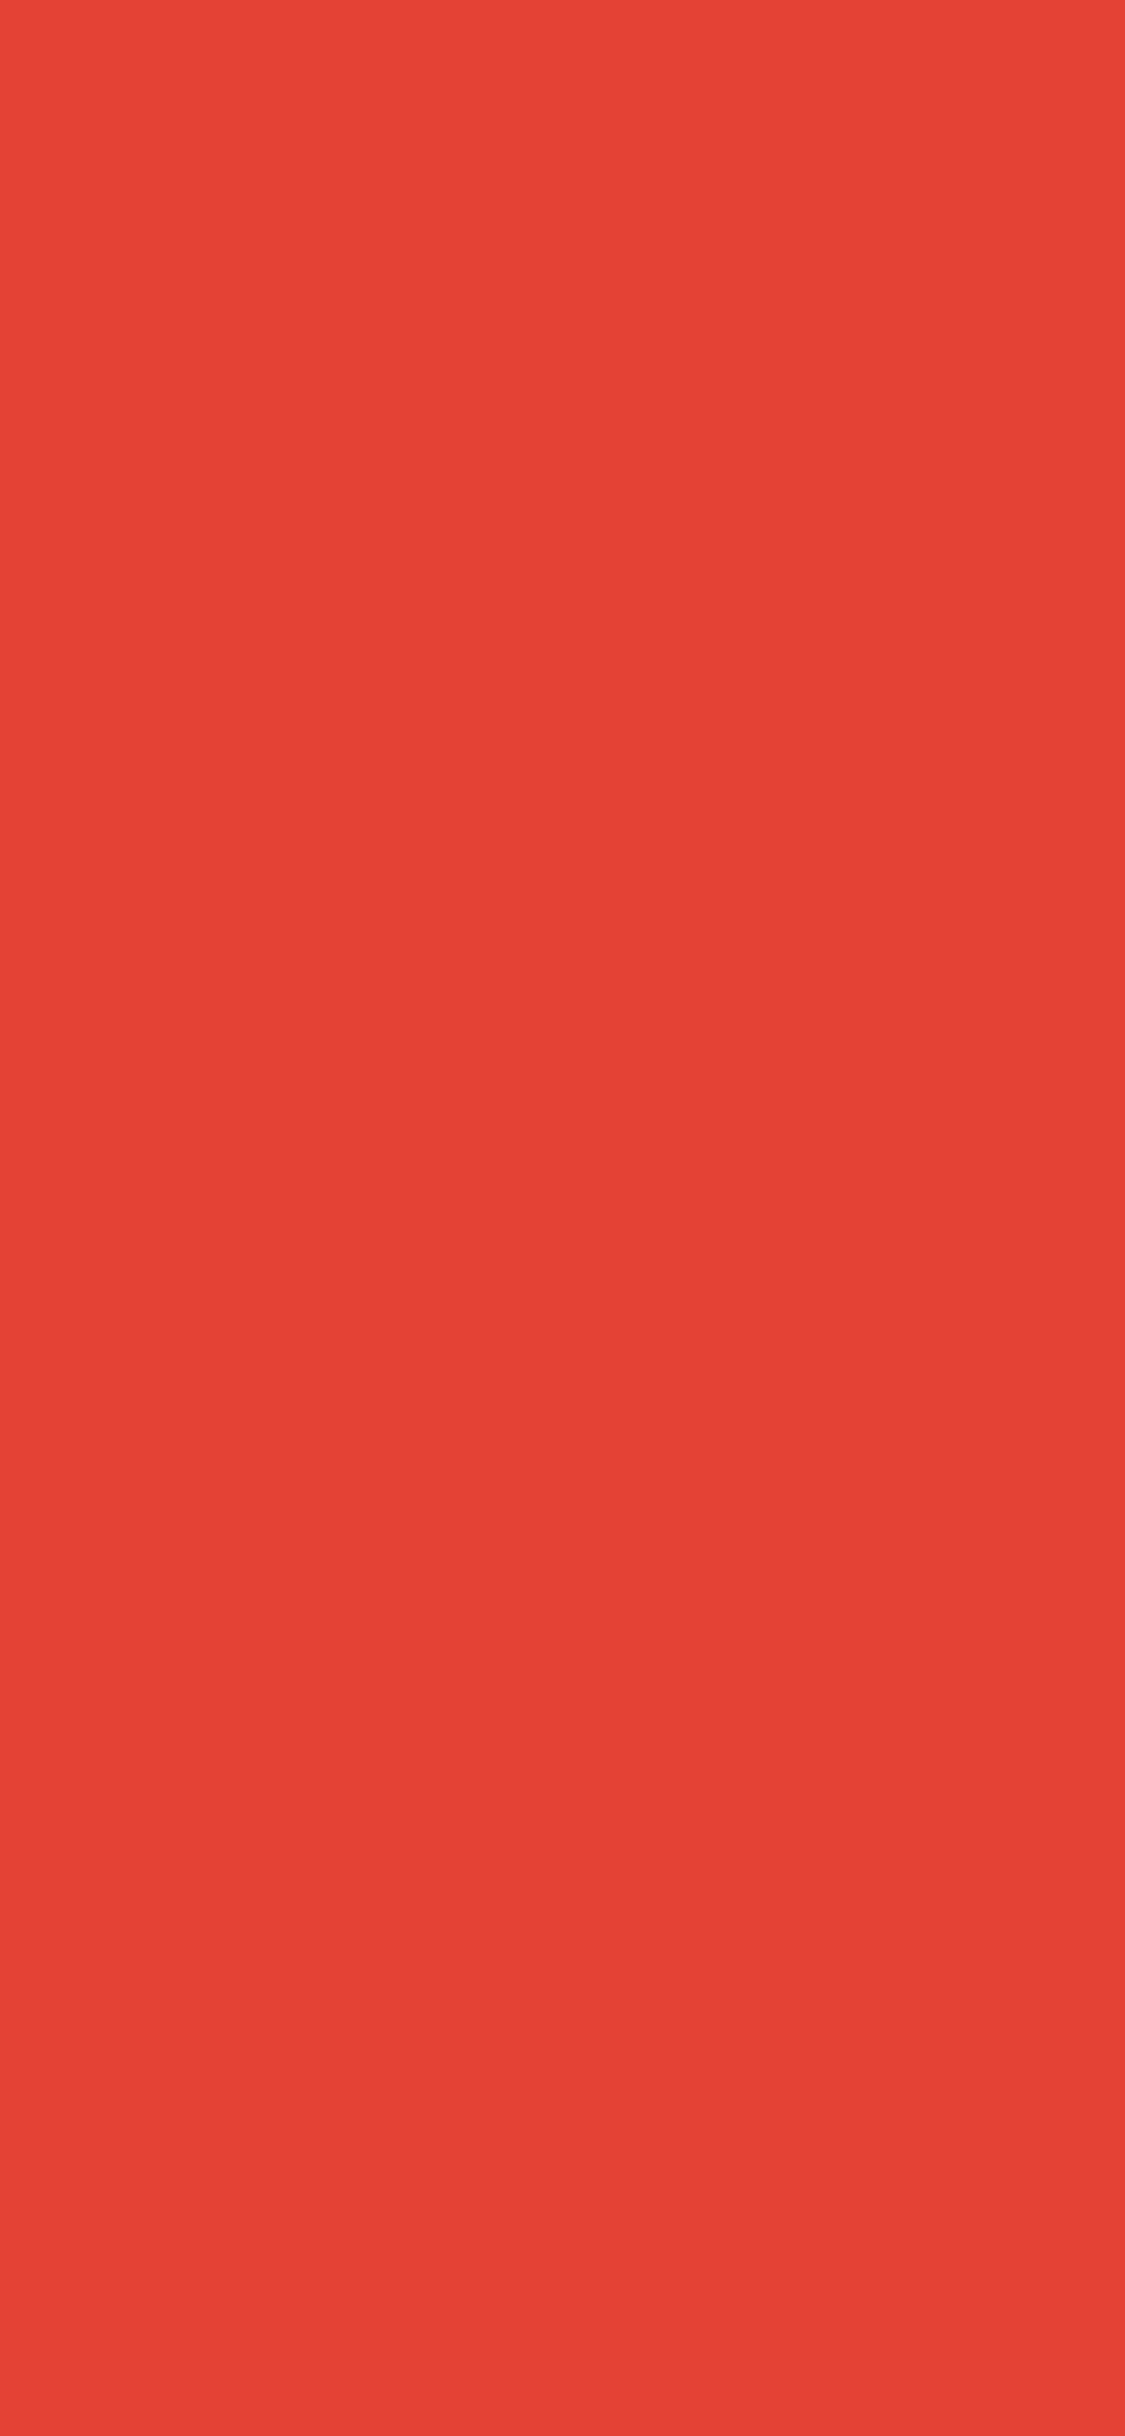 1125x2436 Vermilion Cinnabar Solid Color Background